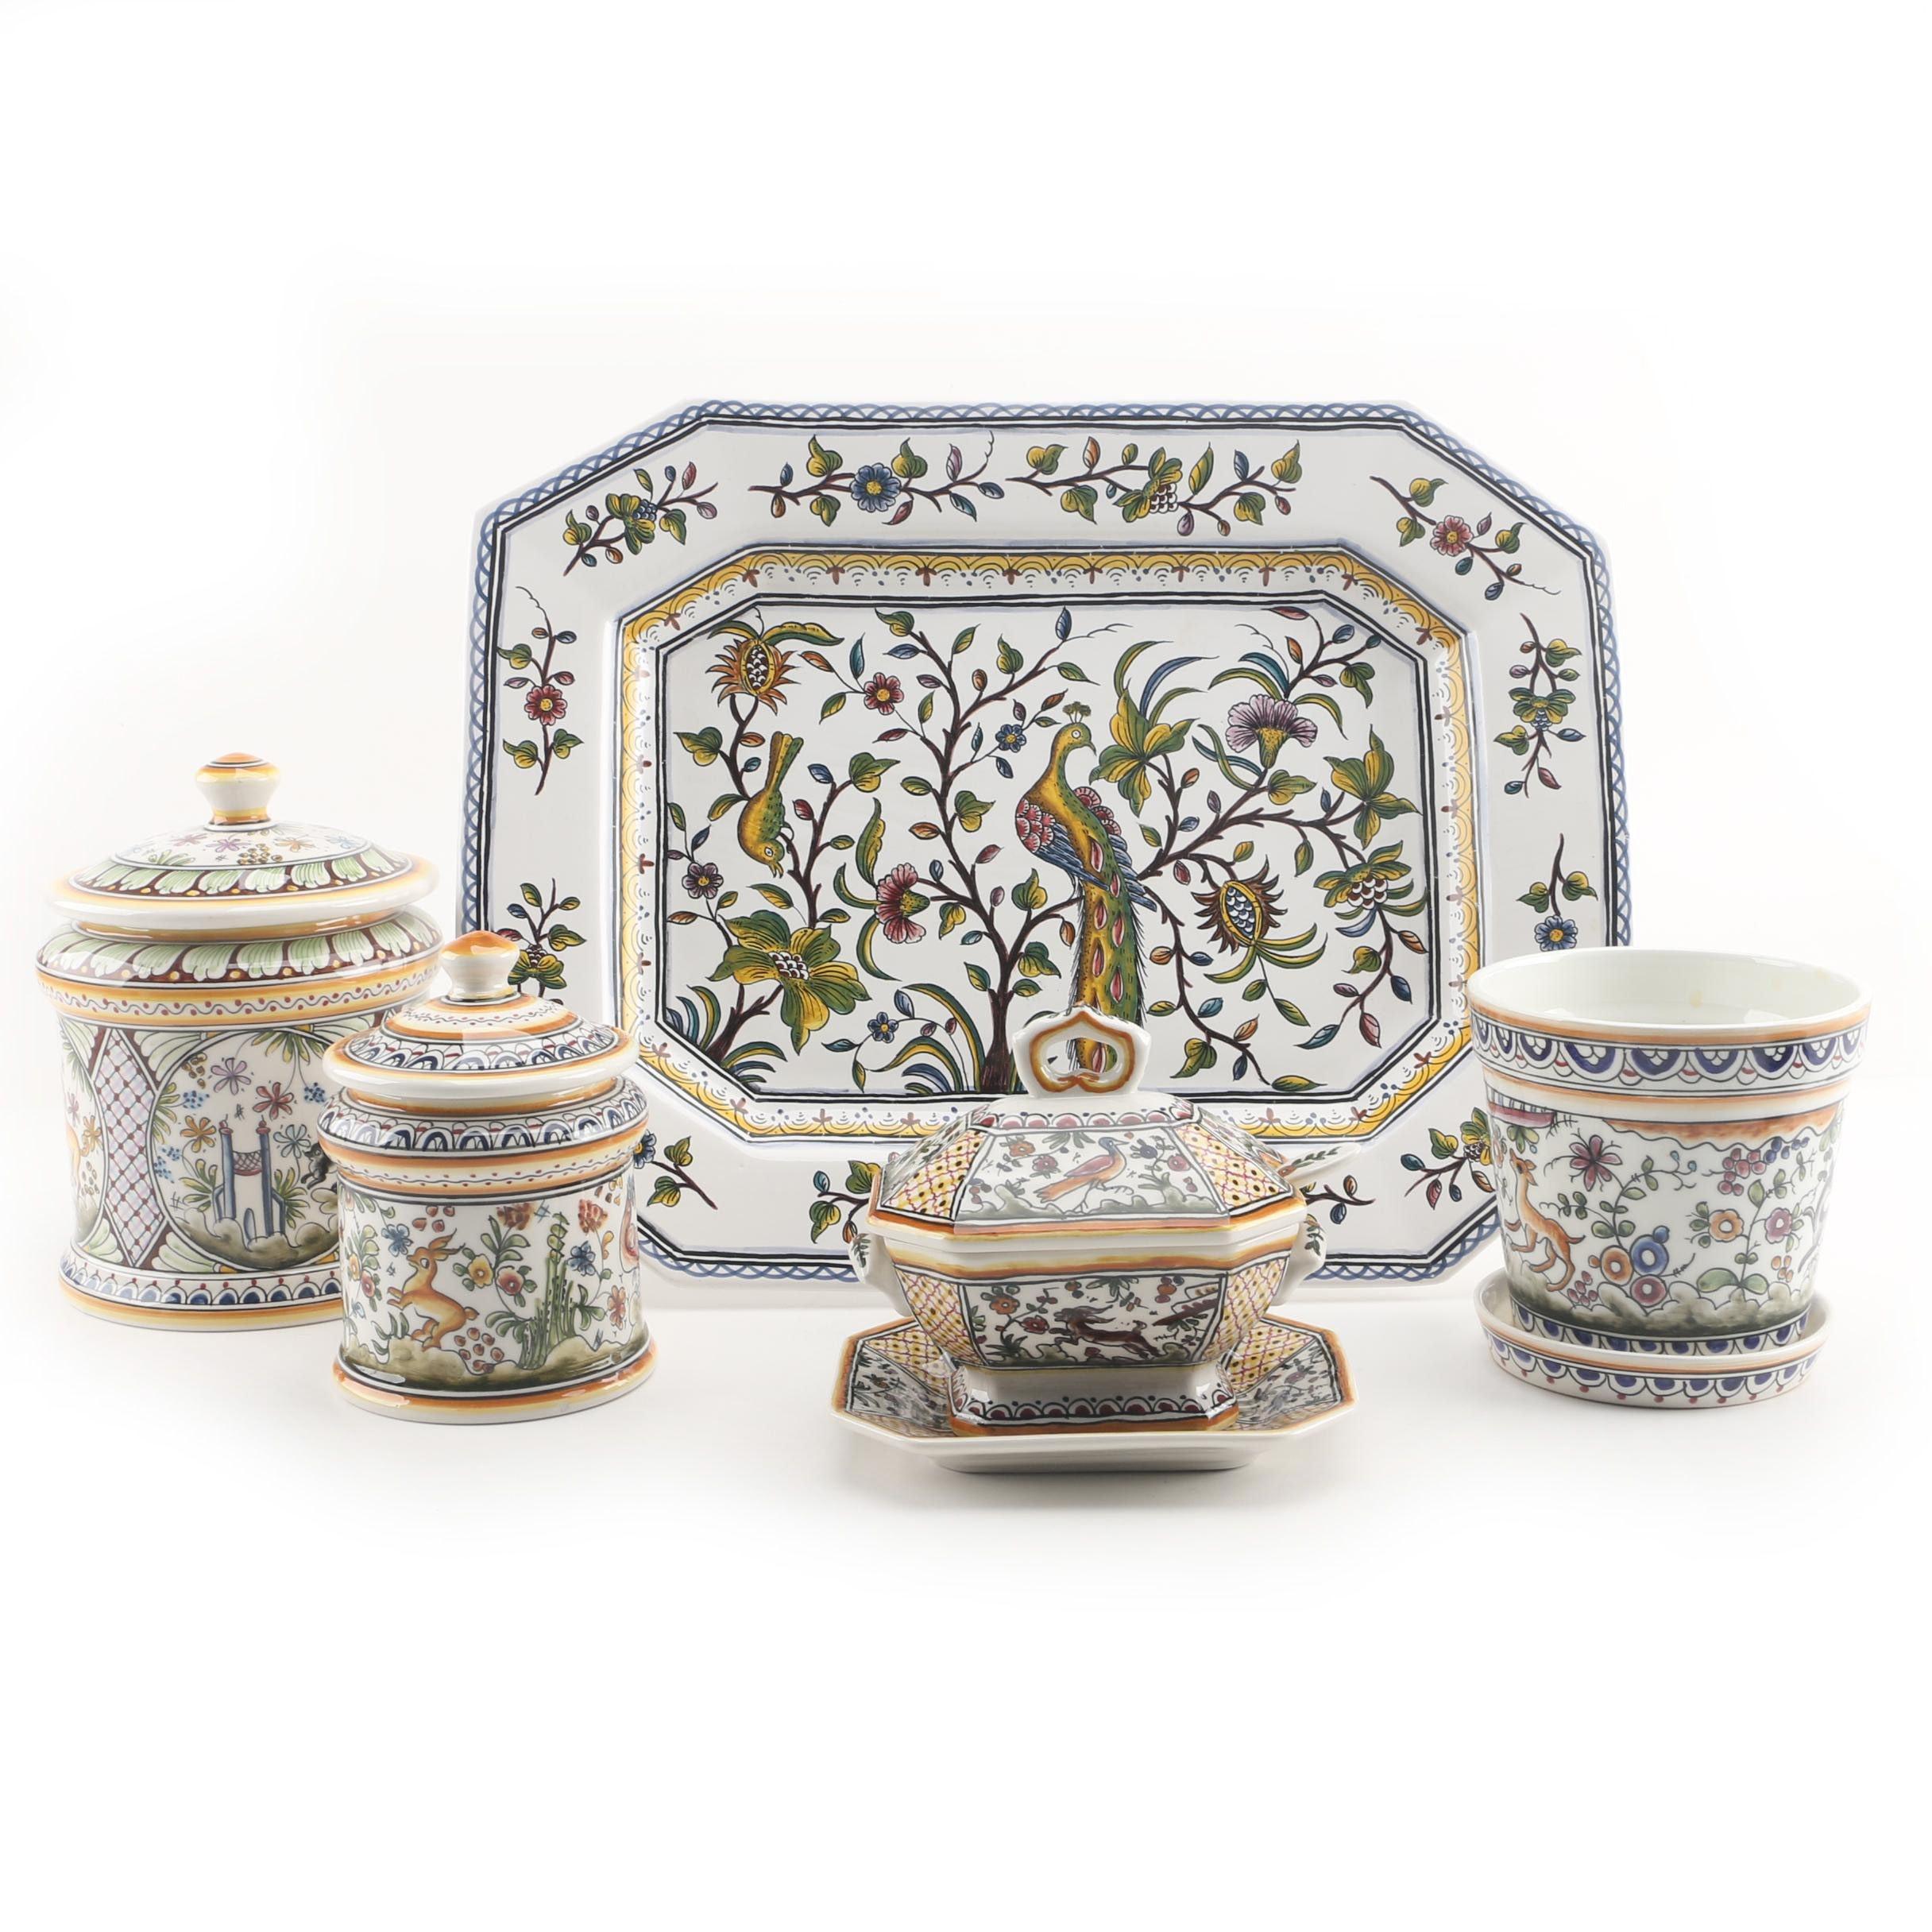 Hand-Painted Portuguese Ceramic Serveware Including Estrella de Conimbriga